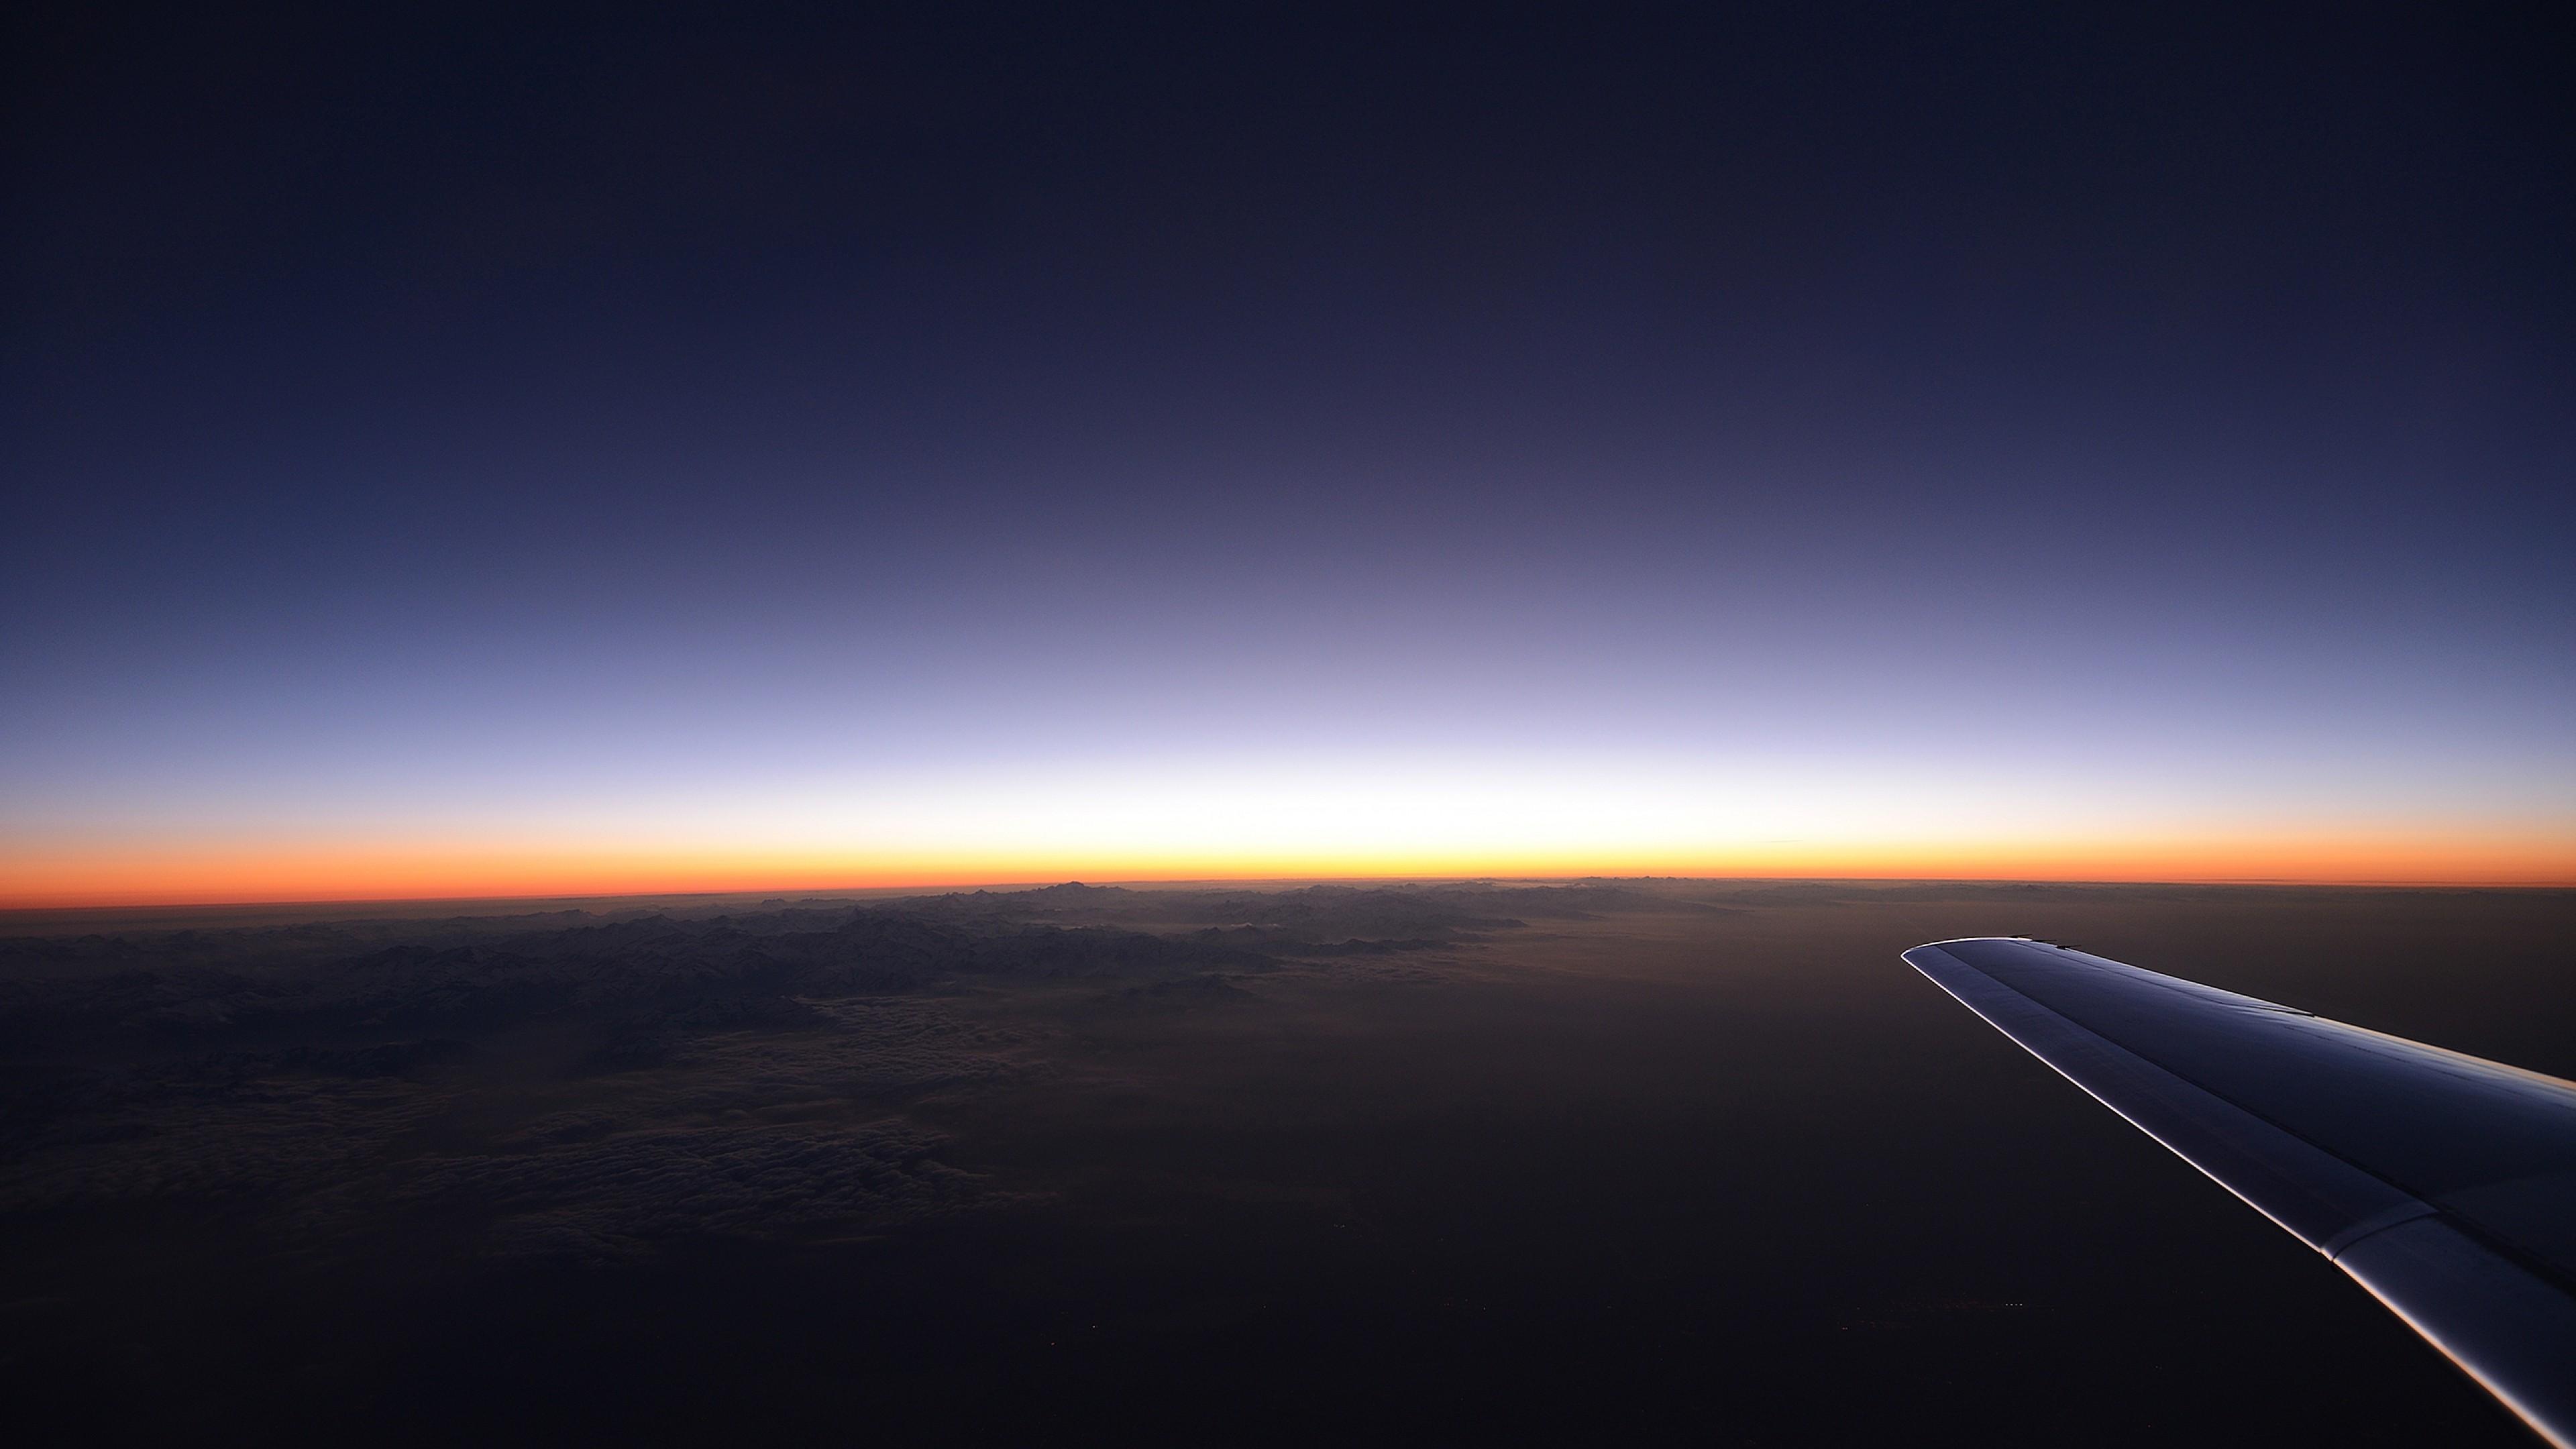 1680x1050 Plane Flight Sky View 1680x1050 Resolution HD 4k